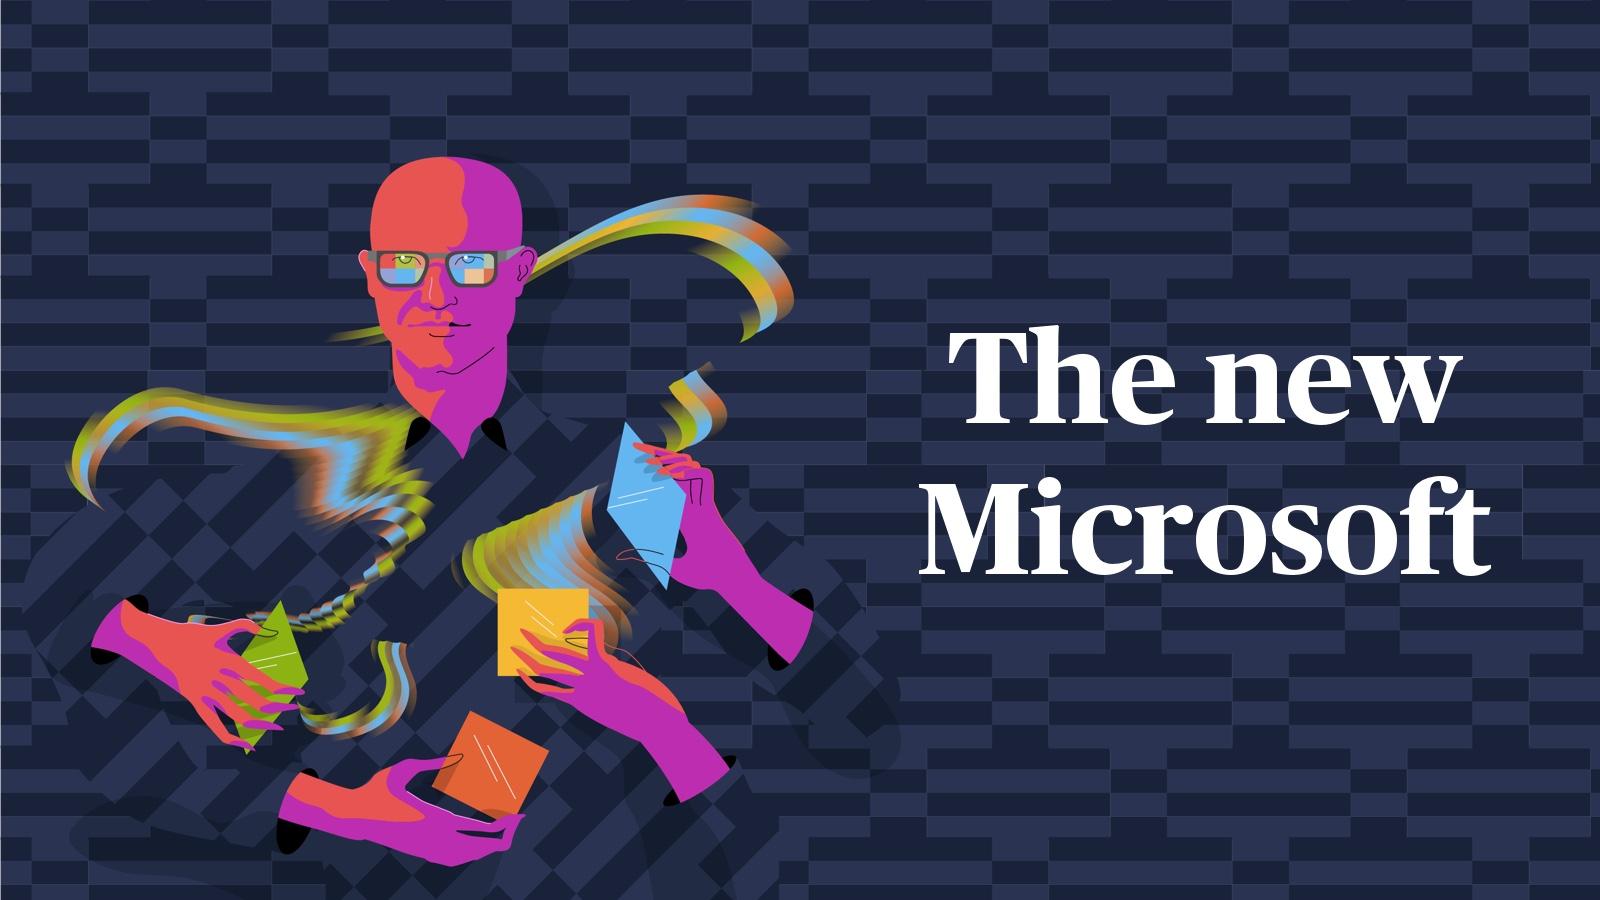 The new Microsoft